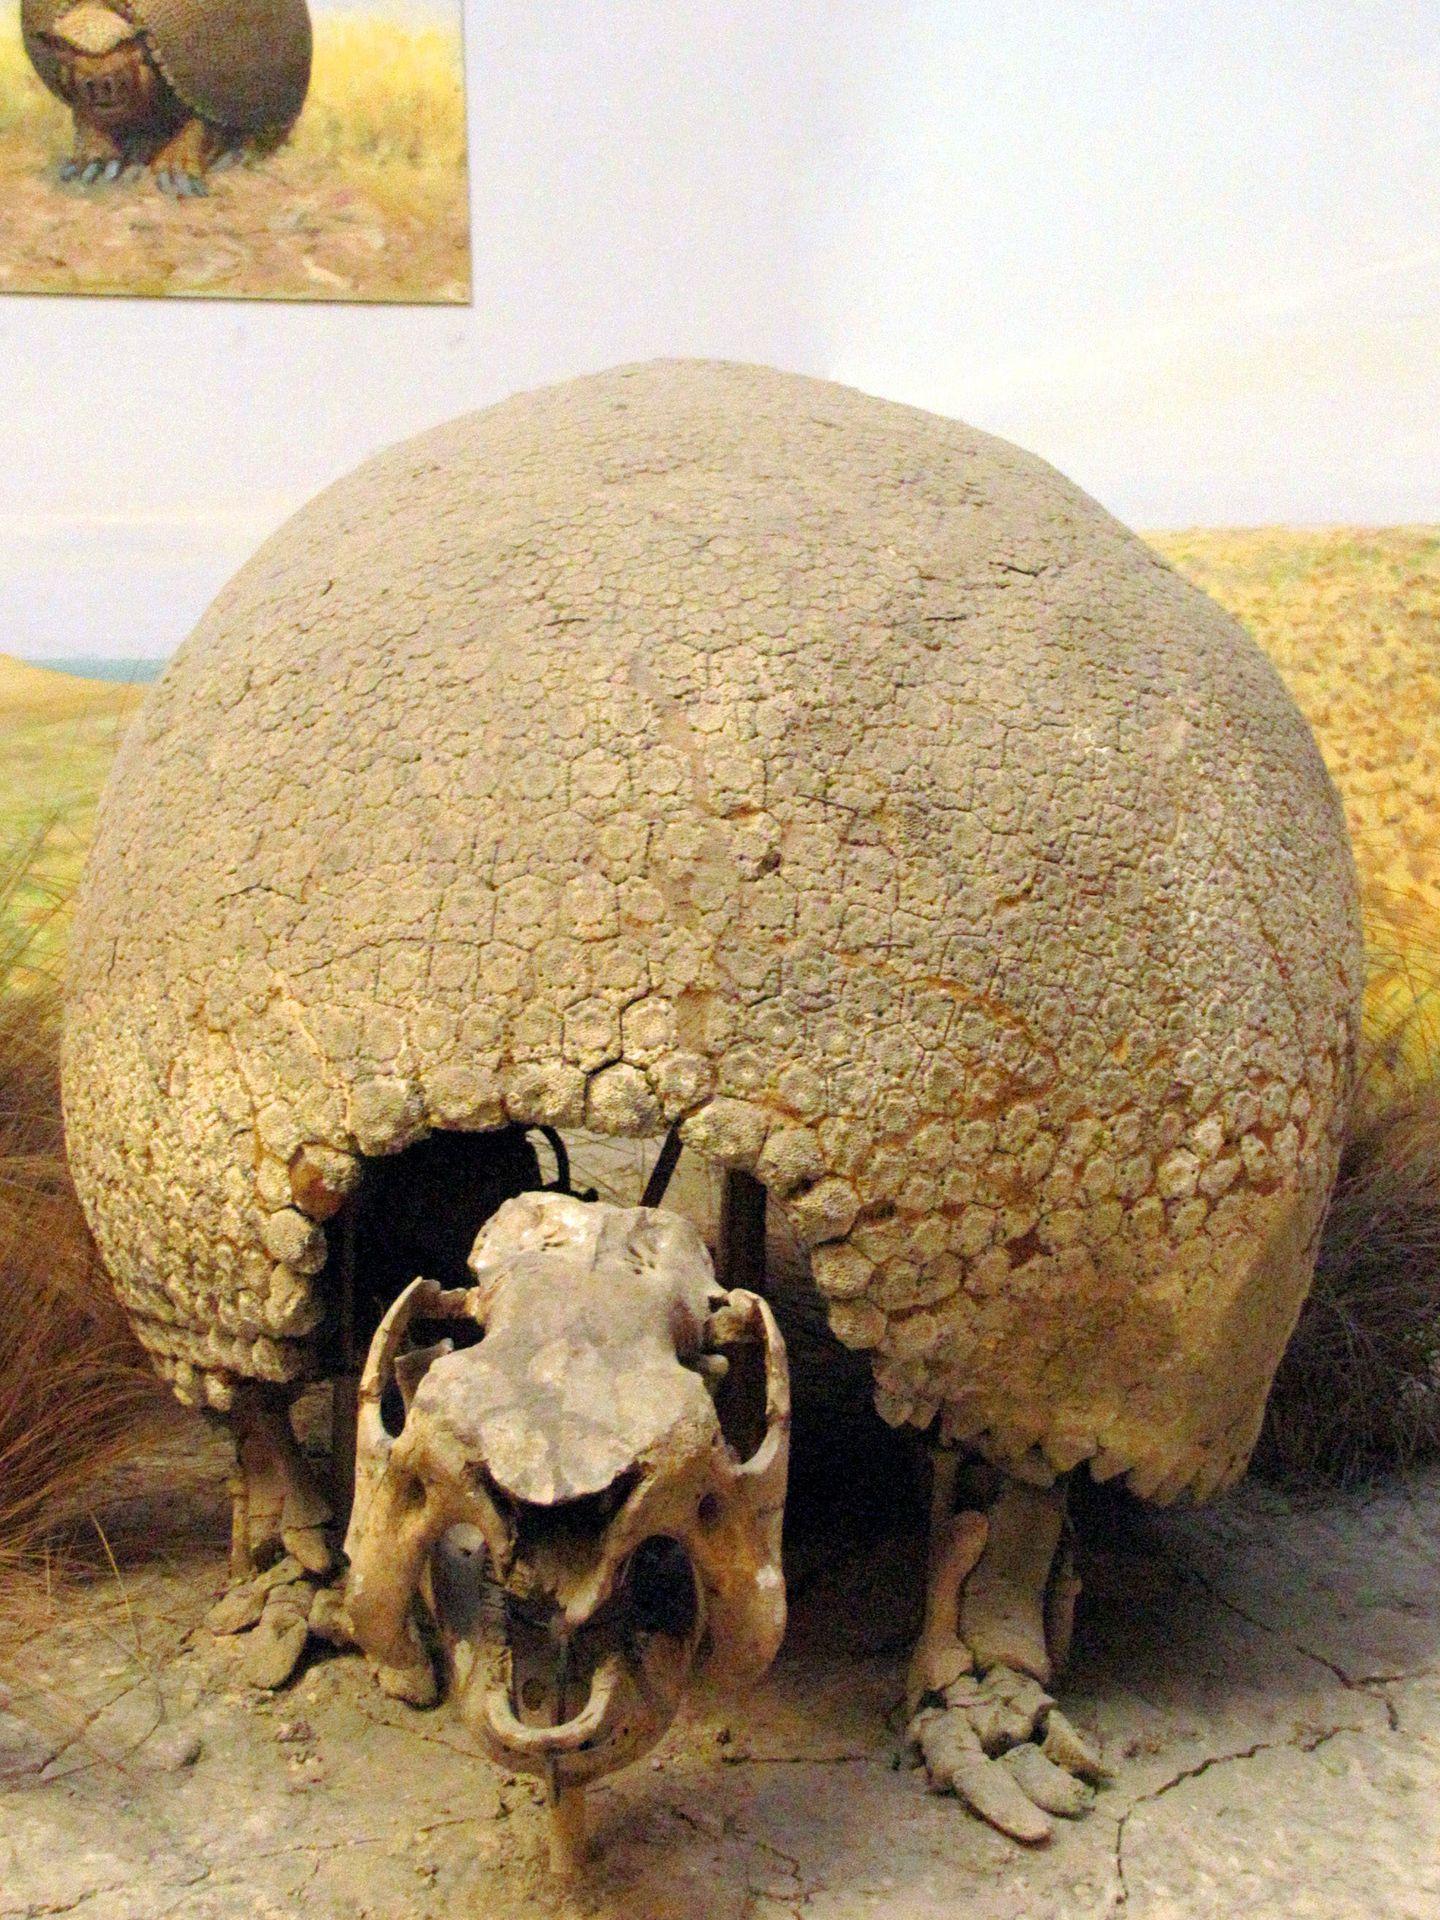 Esqueleto de un 'gliptodonte' exhibido en Buenos Aires. (Wikimedia Commons)